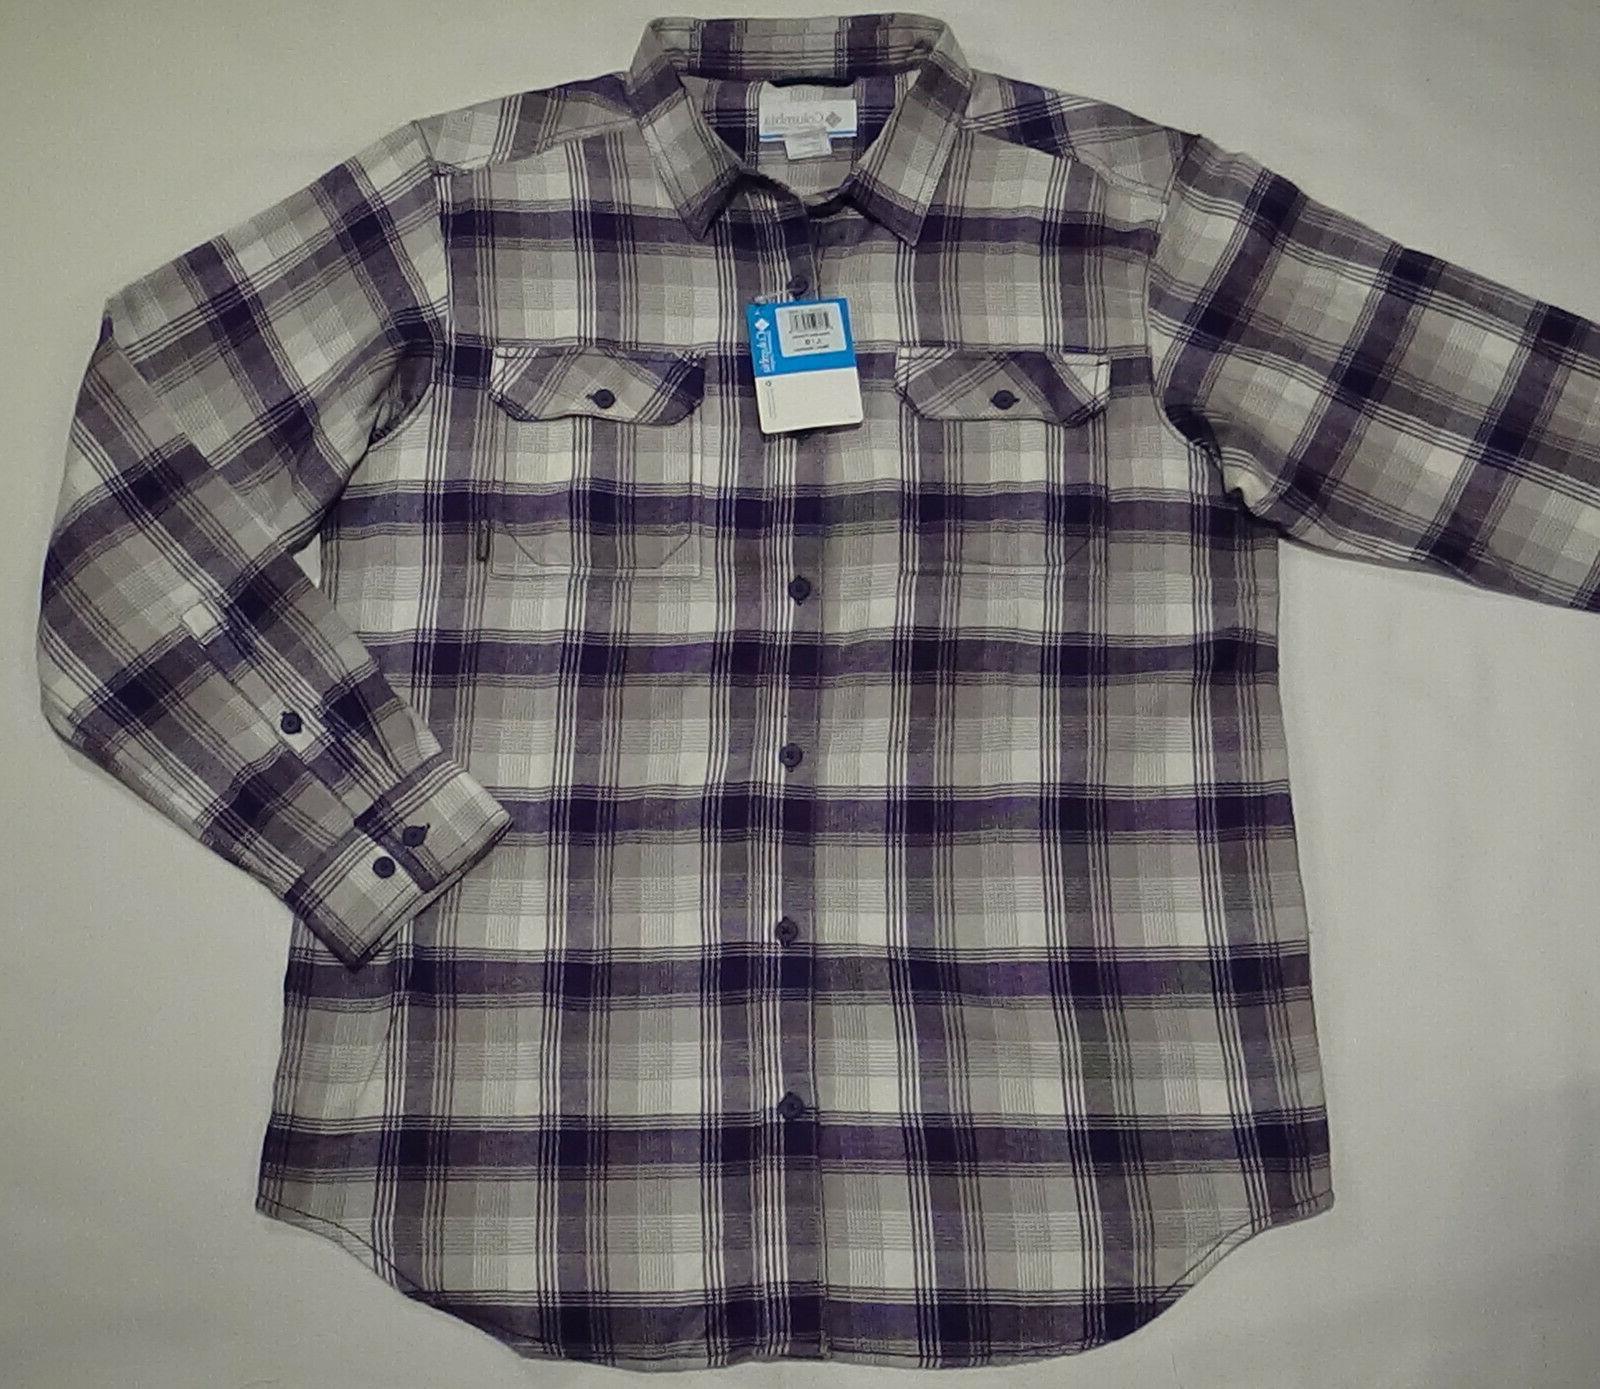 100 percent cotton flannel button down shirt